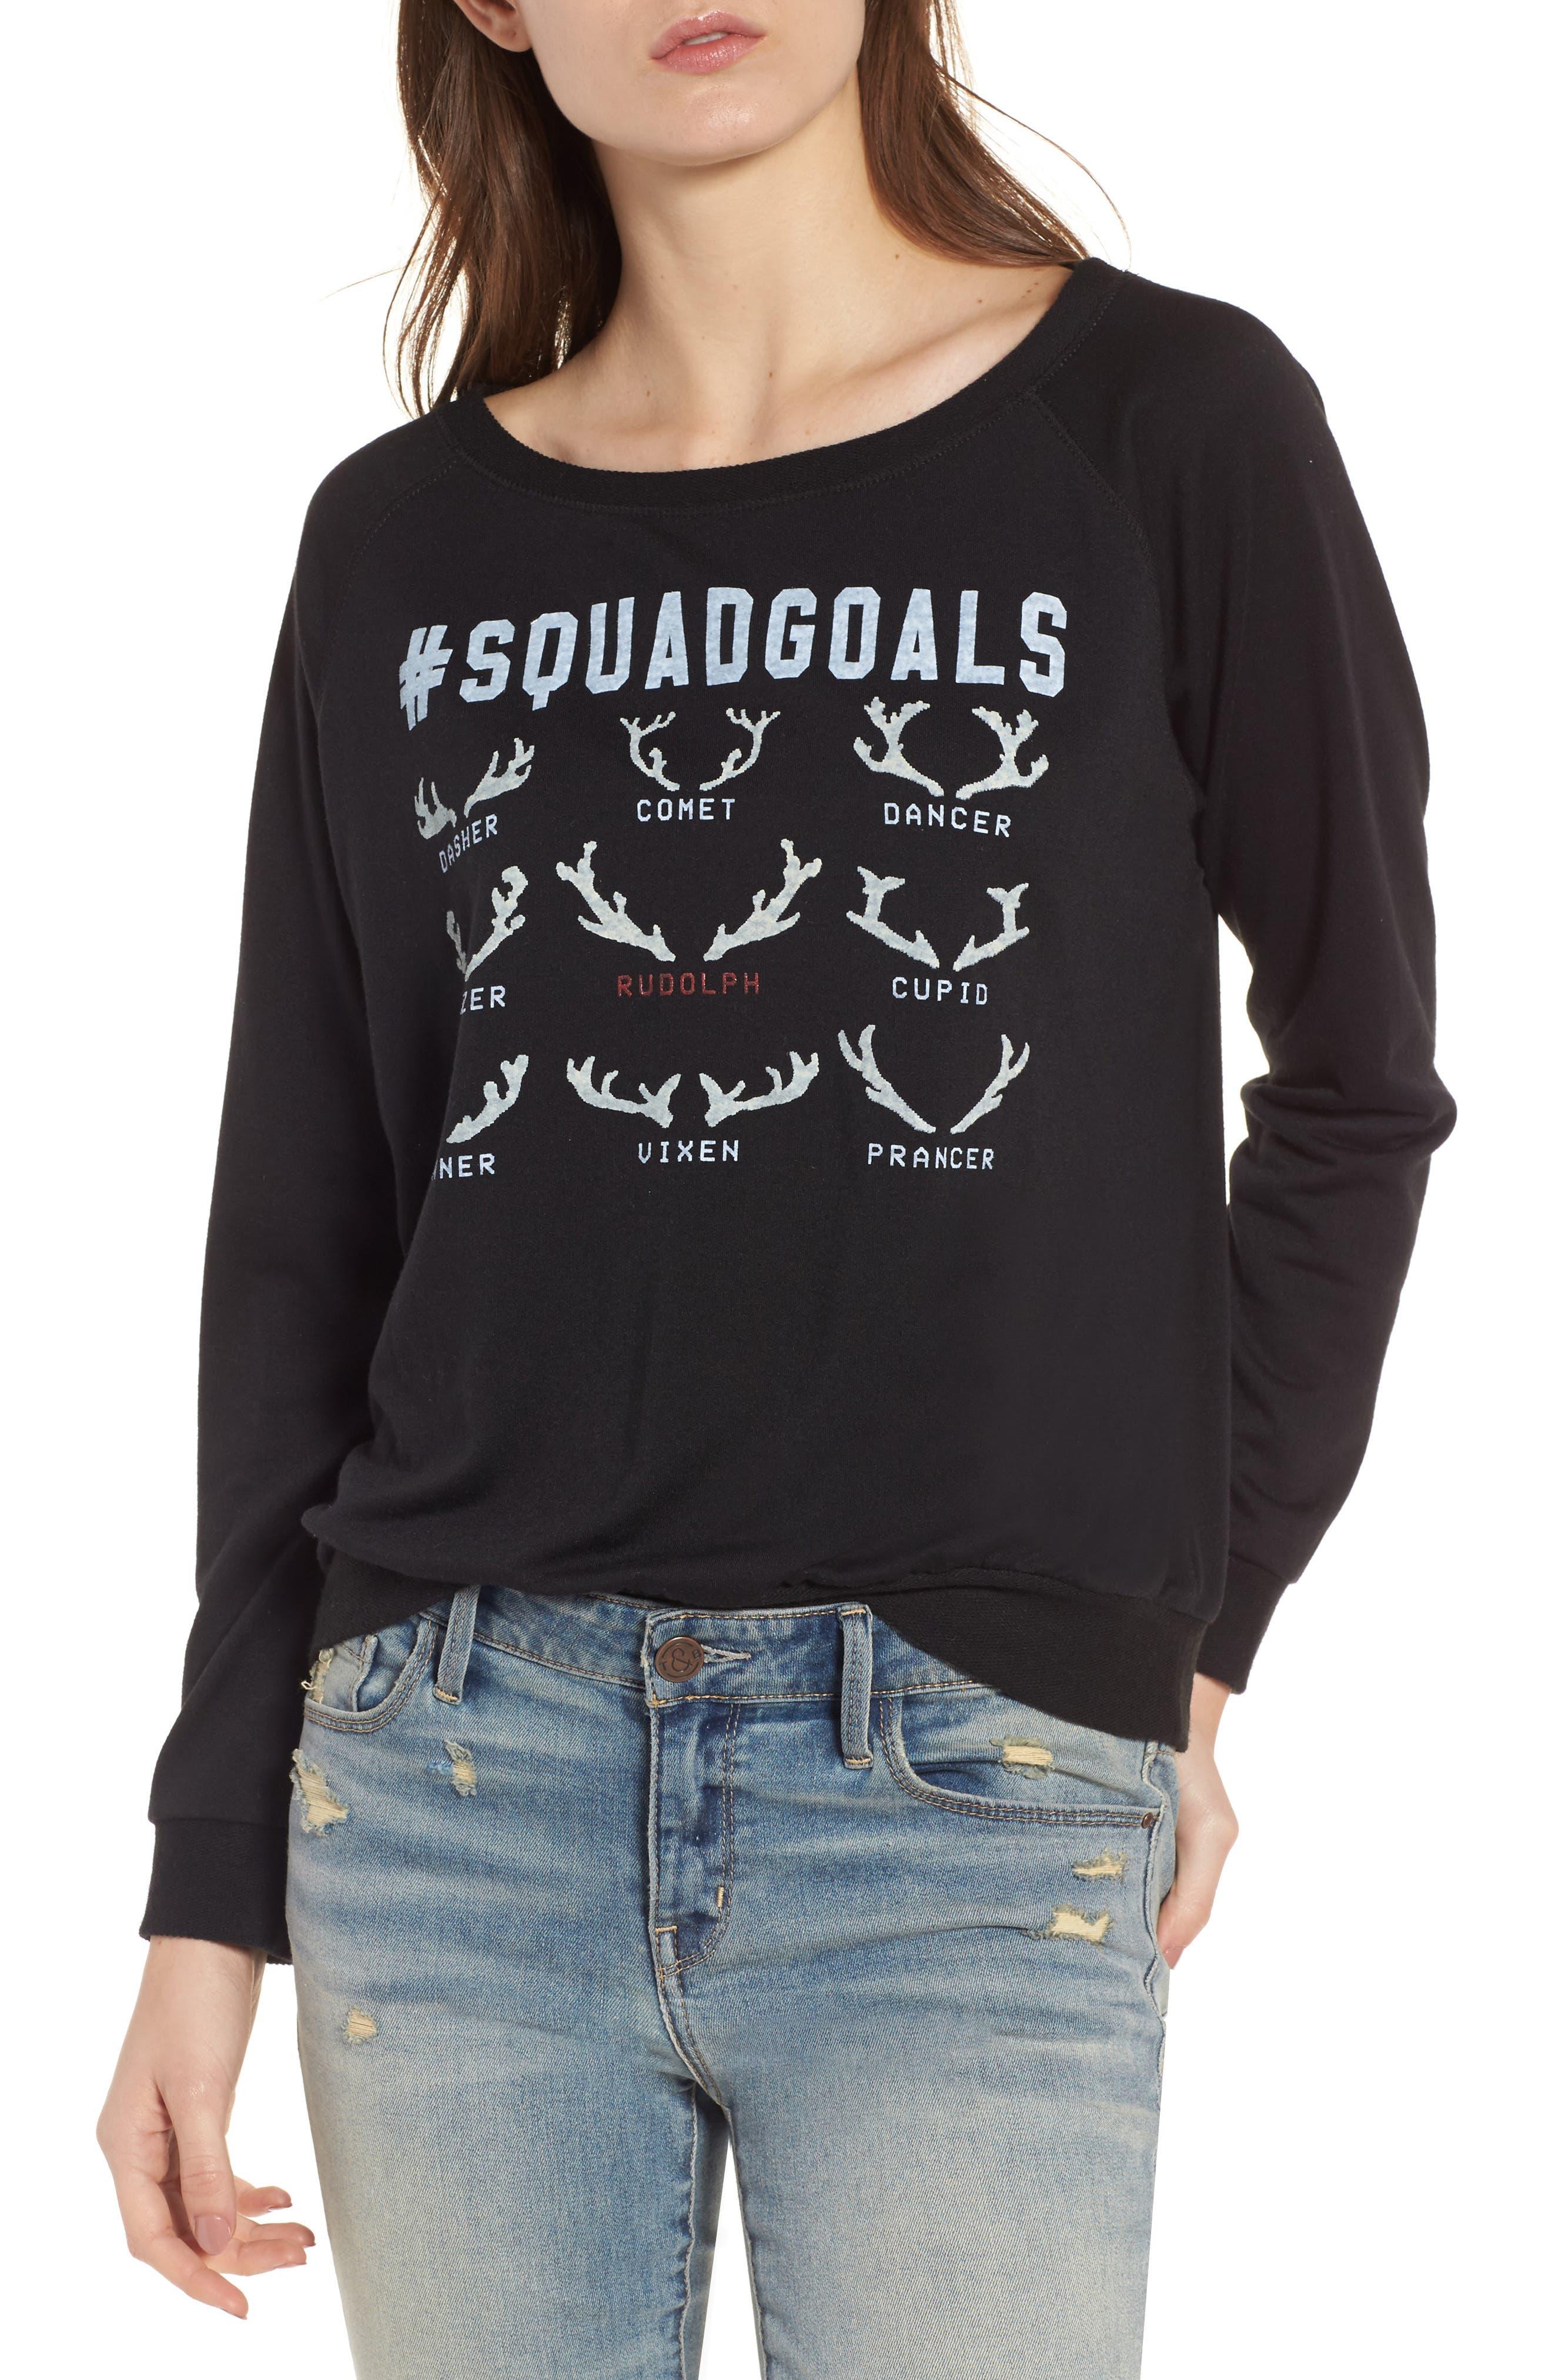 Main Image - Prince Peter #SquadGoals Sweatshirt